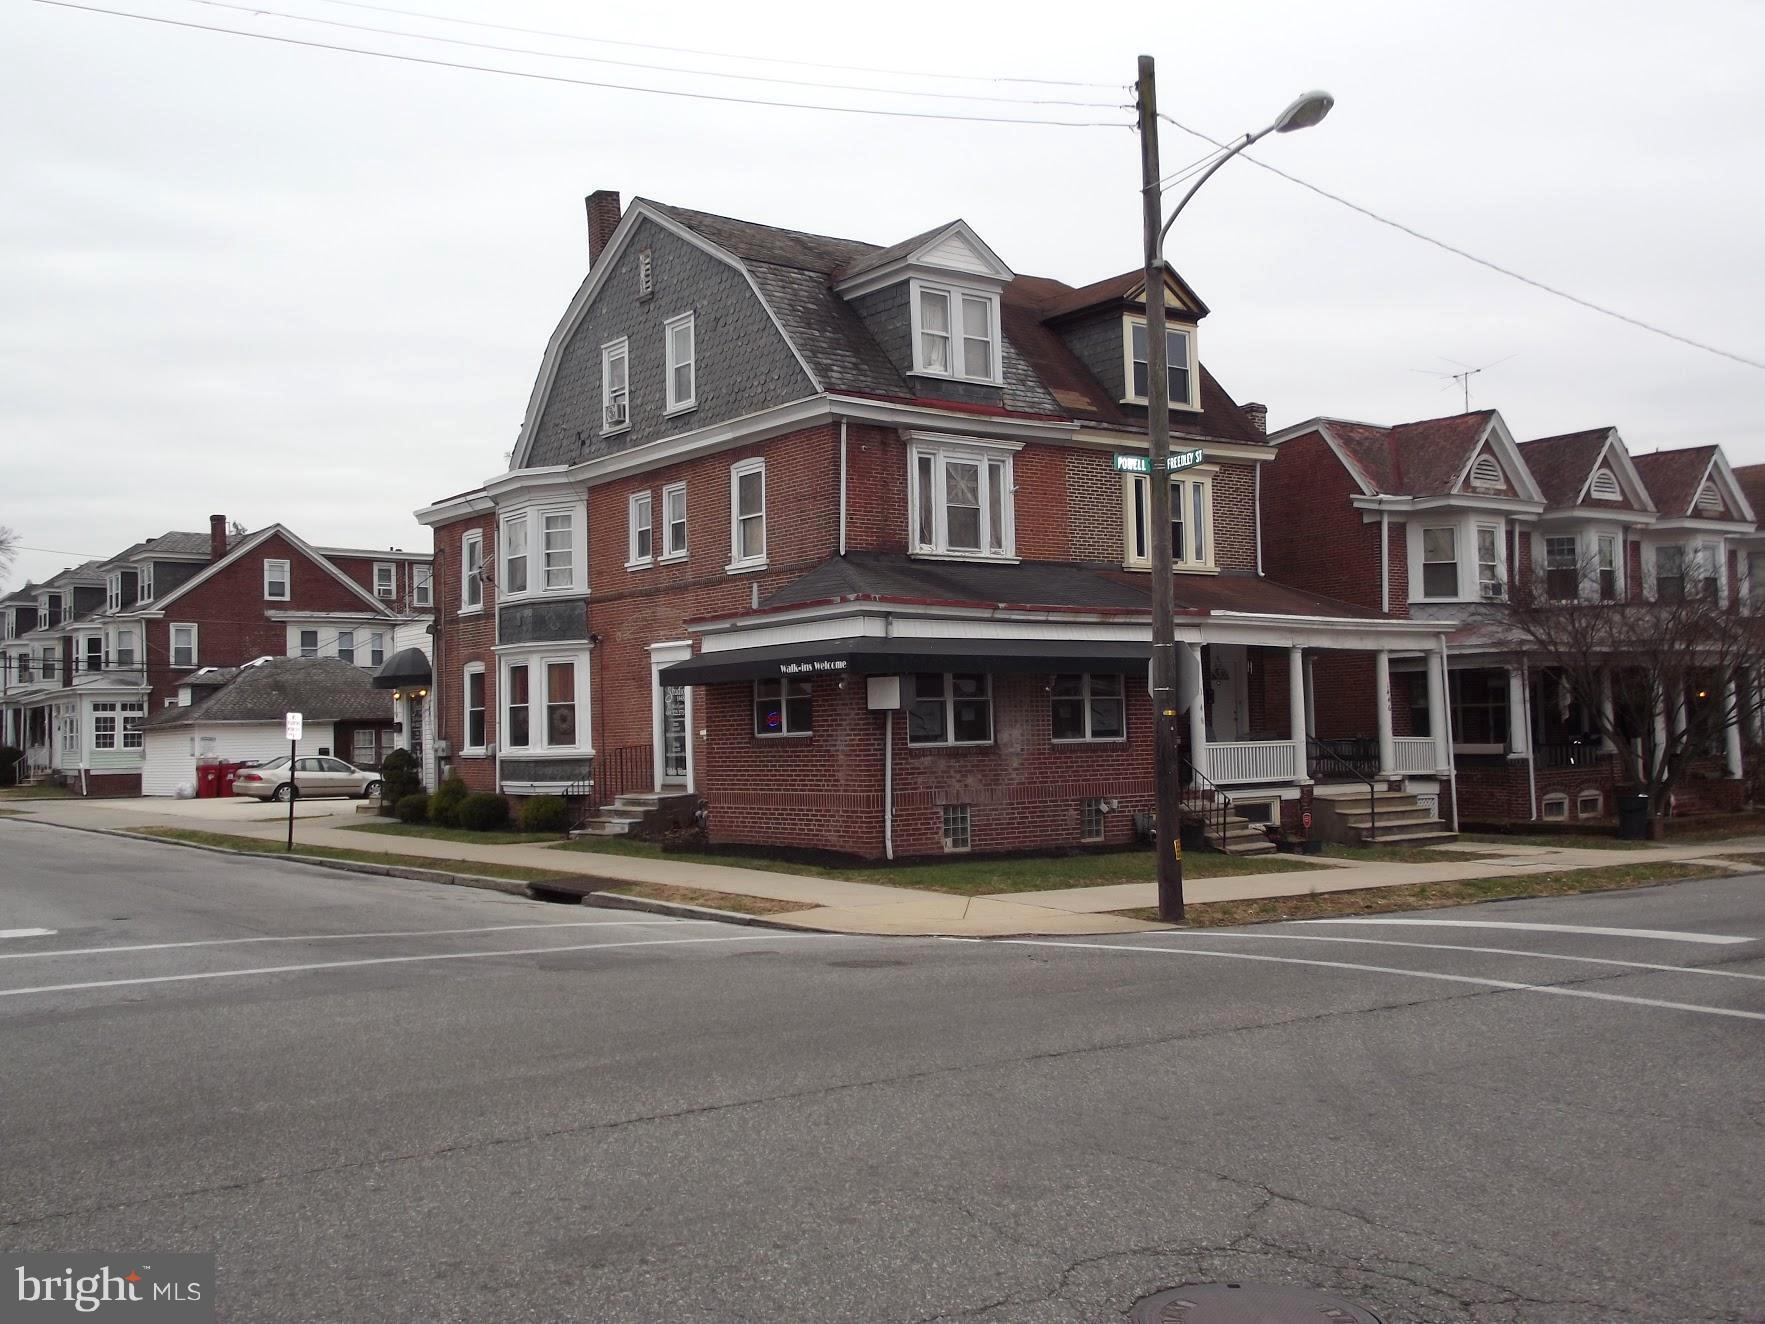 1448 POWELL STREET, NORRISTOWN, PA 19401